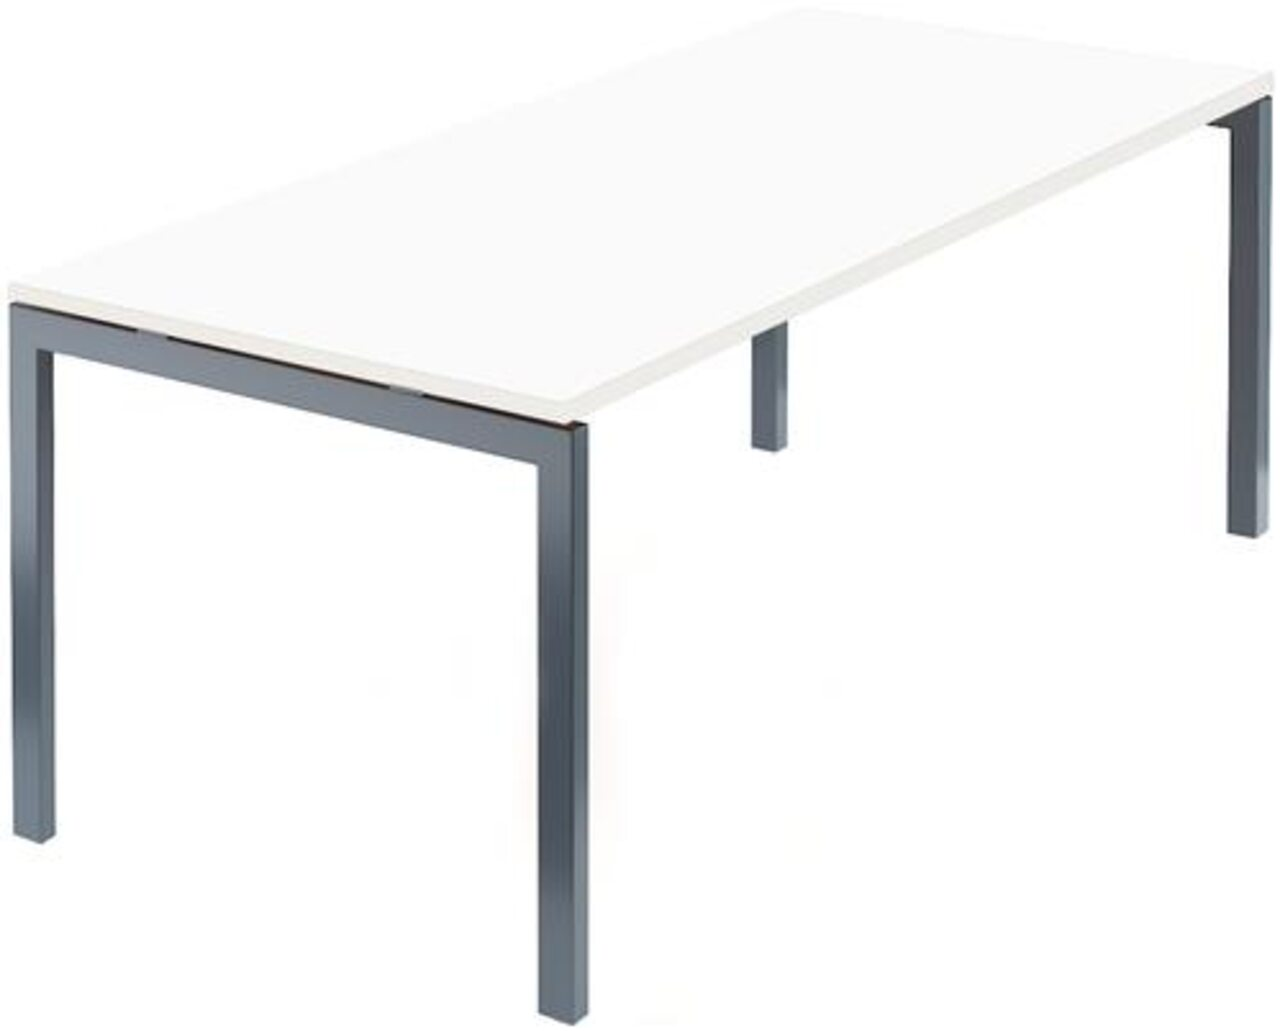 Стол на м/каркасе для заседаний/антрацит Арго 180x85x76 - фото 5